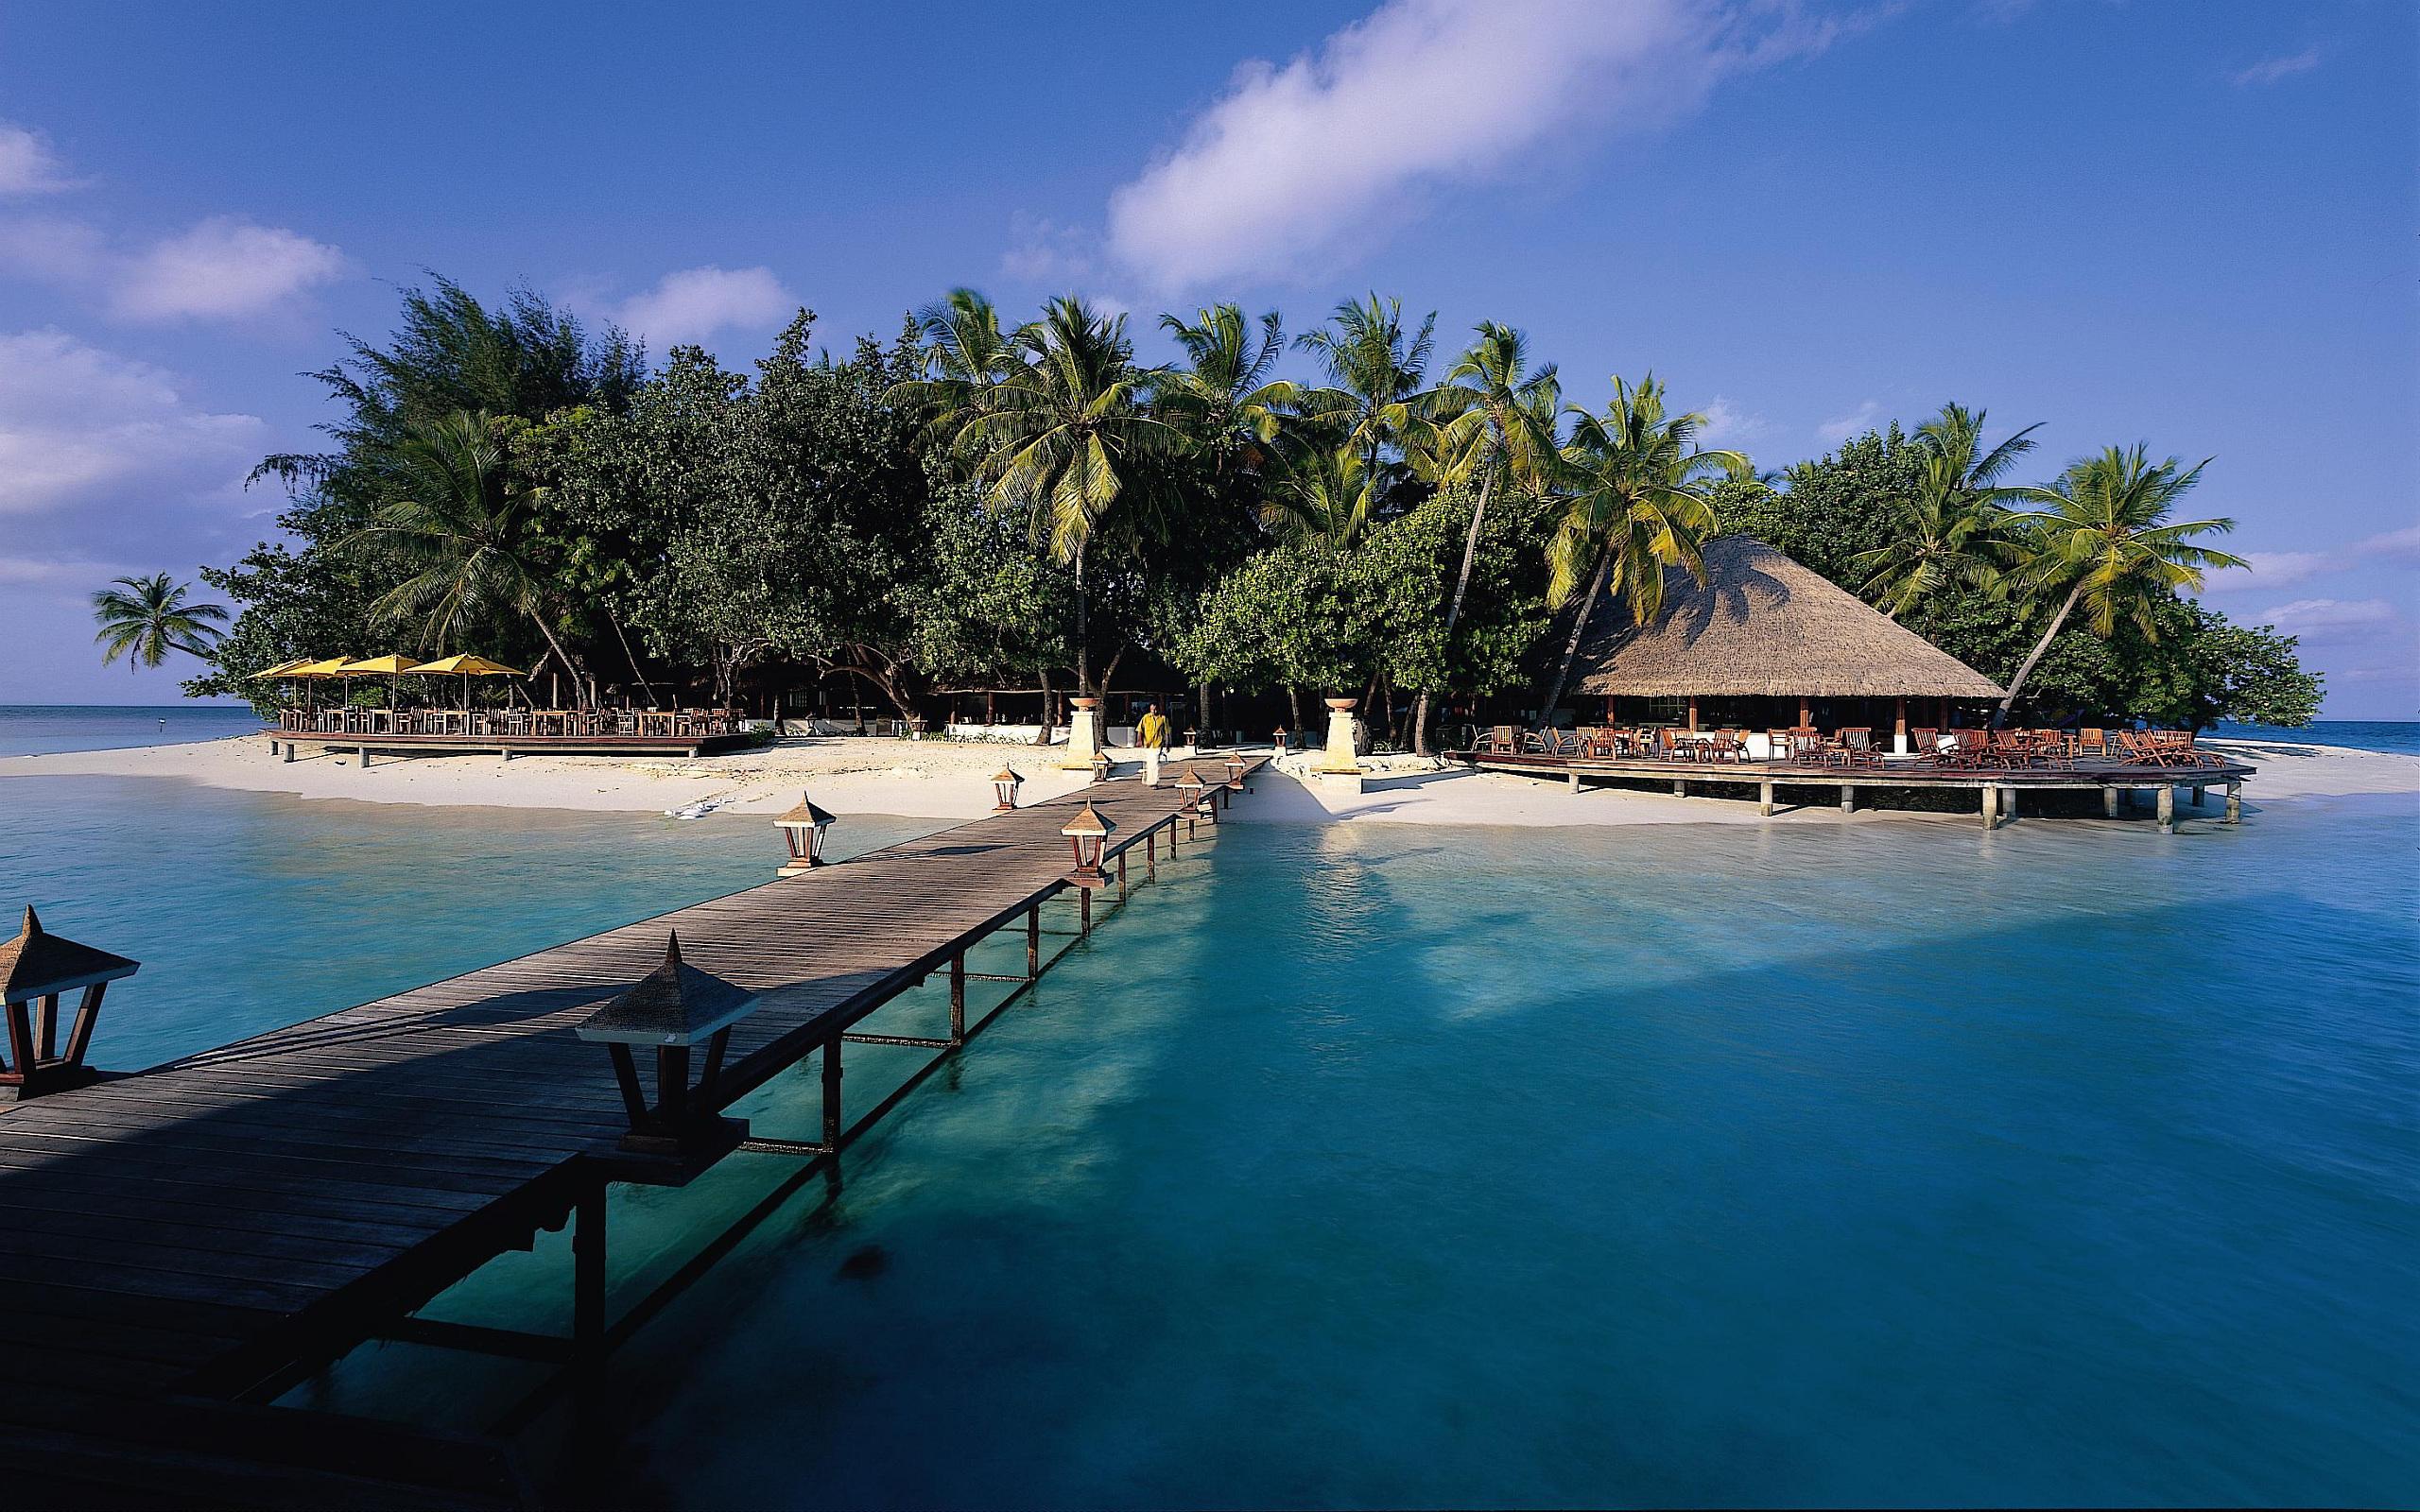 angsana resort maldives